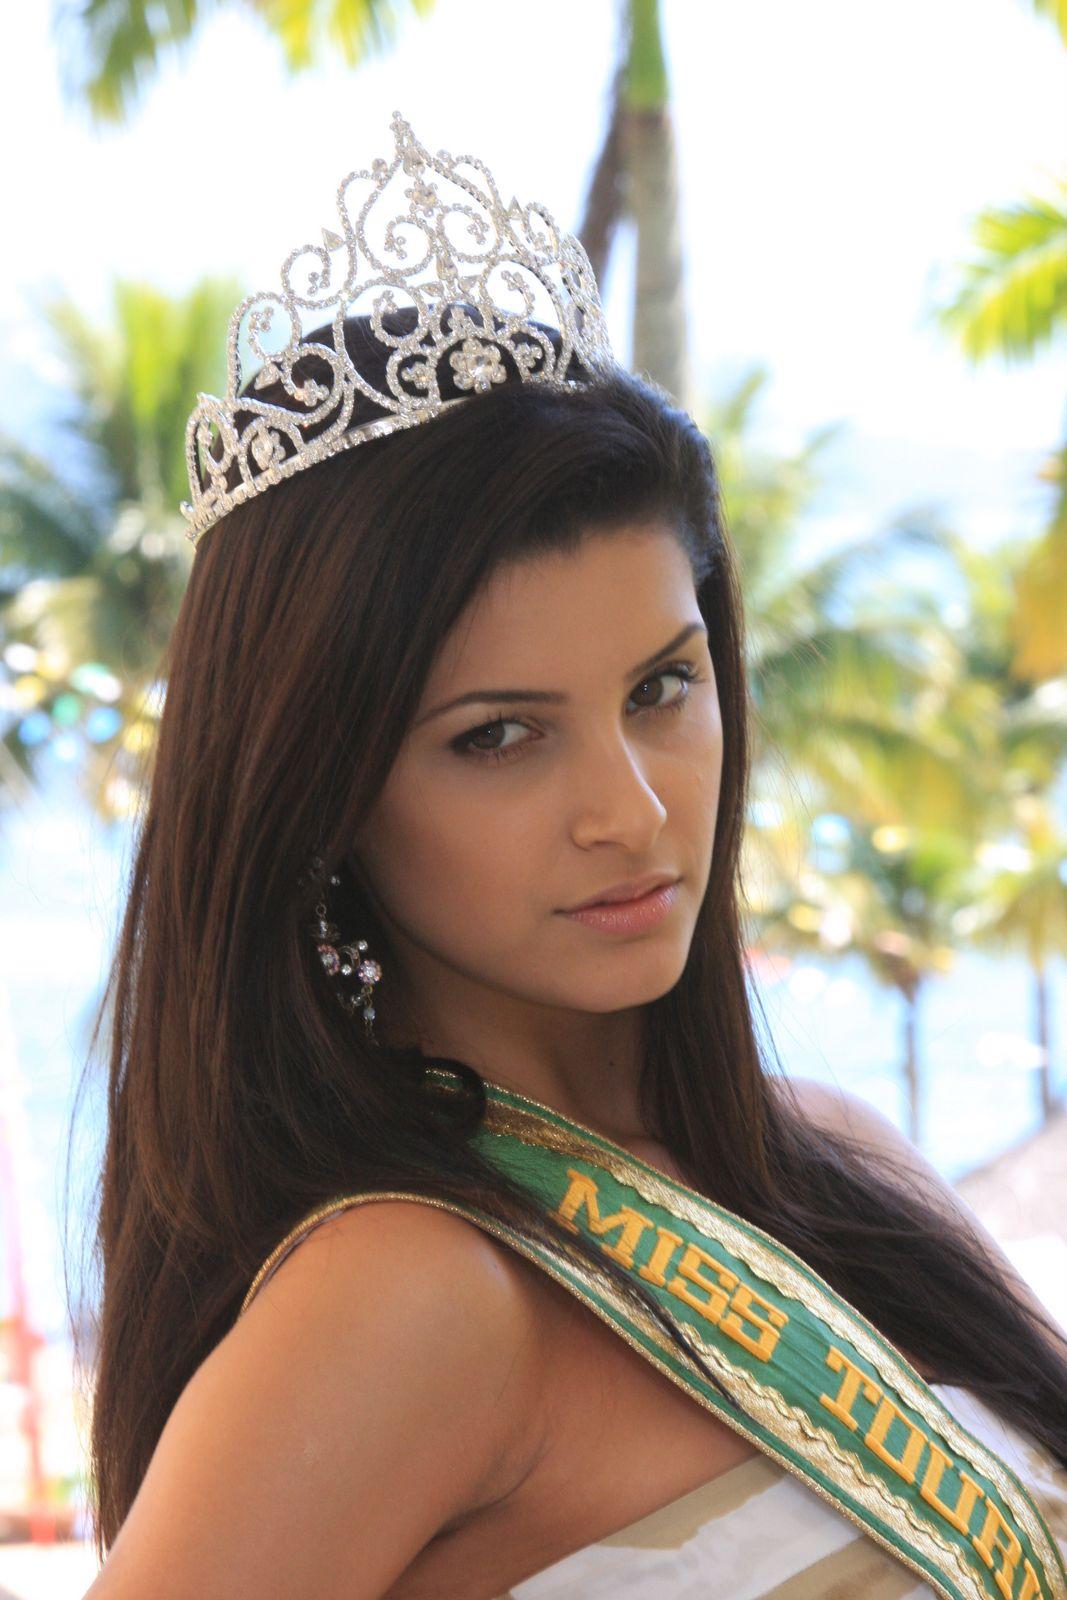 vivian noronha, rainha hispanoamericana 2008. suplente. - Página 4 R2nnqwnz